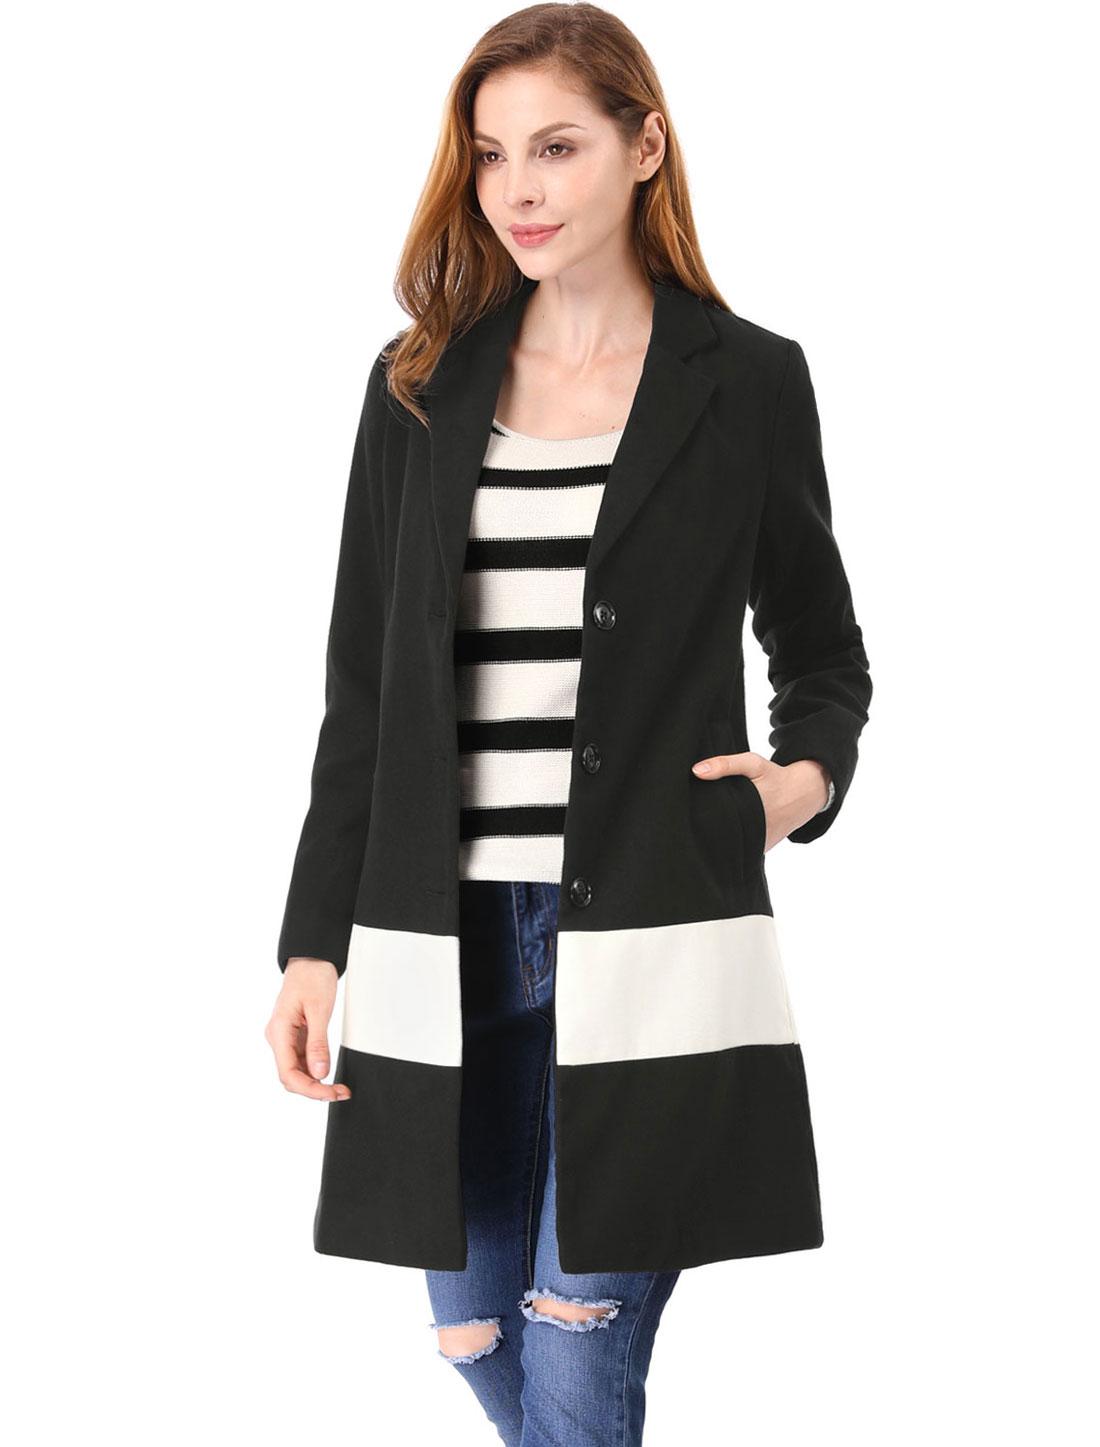 Allegra K Women Contrast Color Notched Lapel Coat Black M